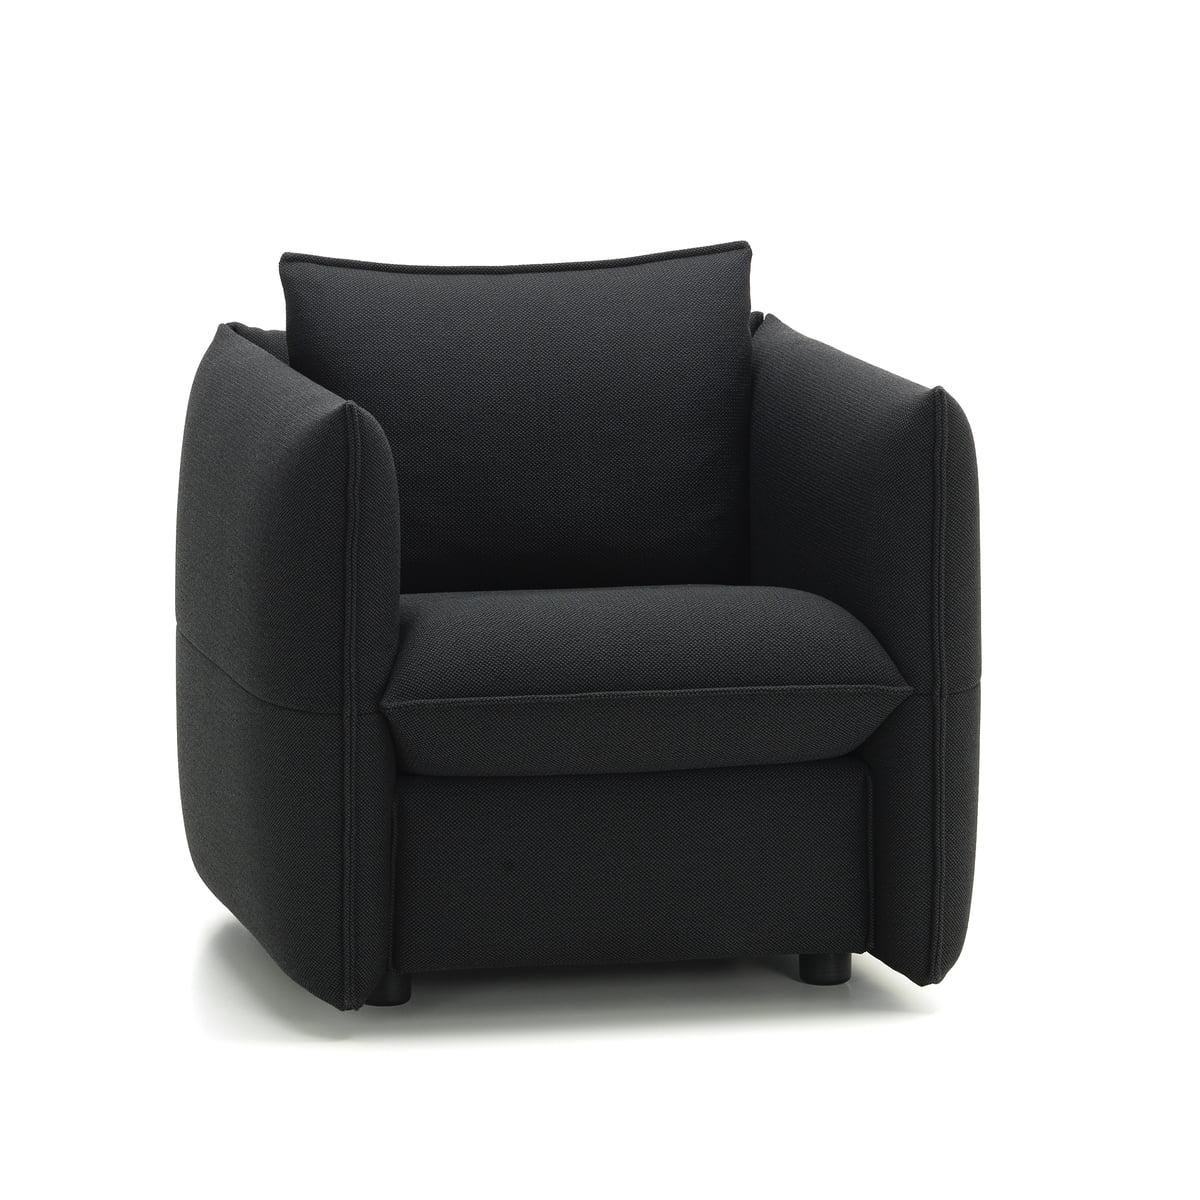 club sessel mariposa von vitra connox shop. Black Bedroom Furniture Sets. Home Design Ideas